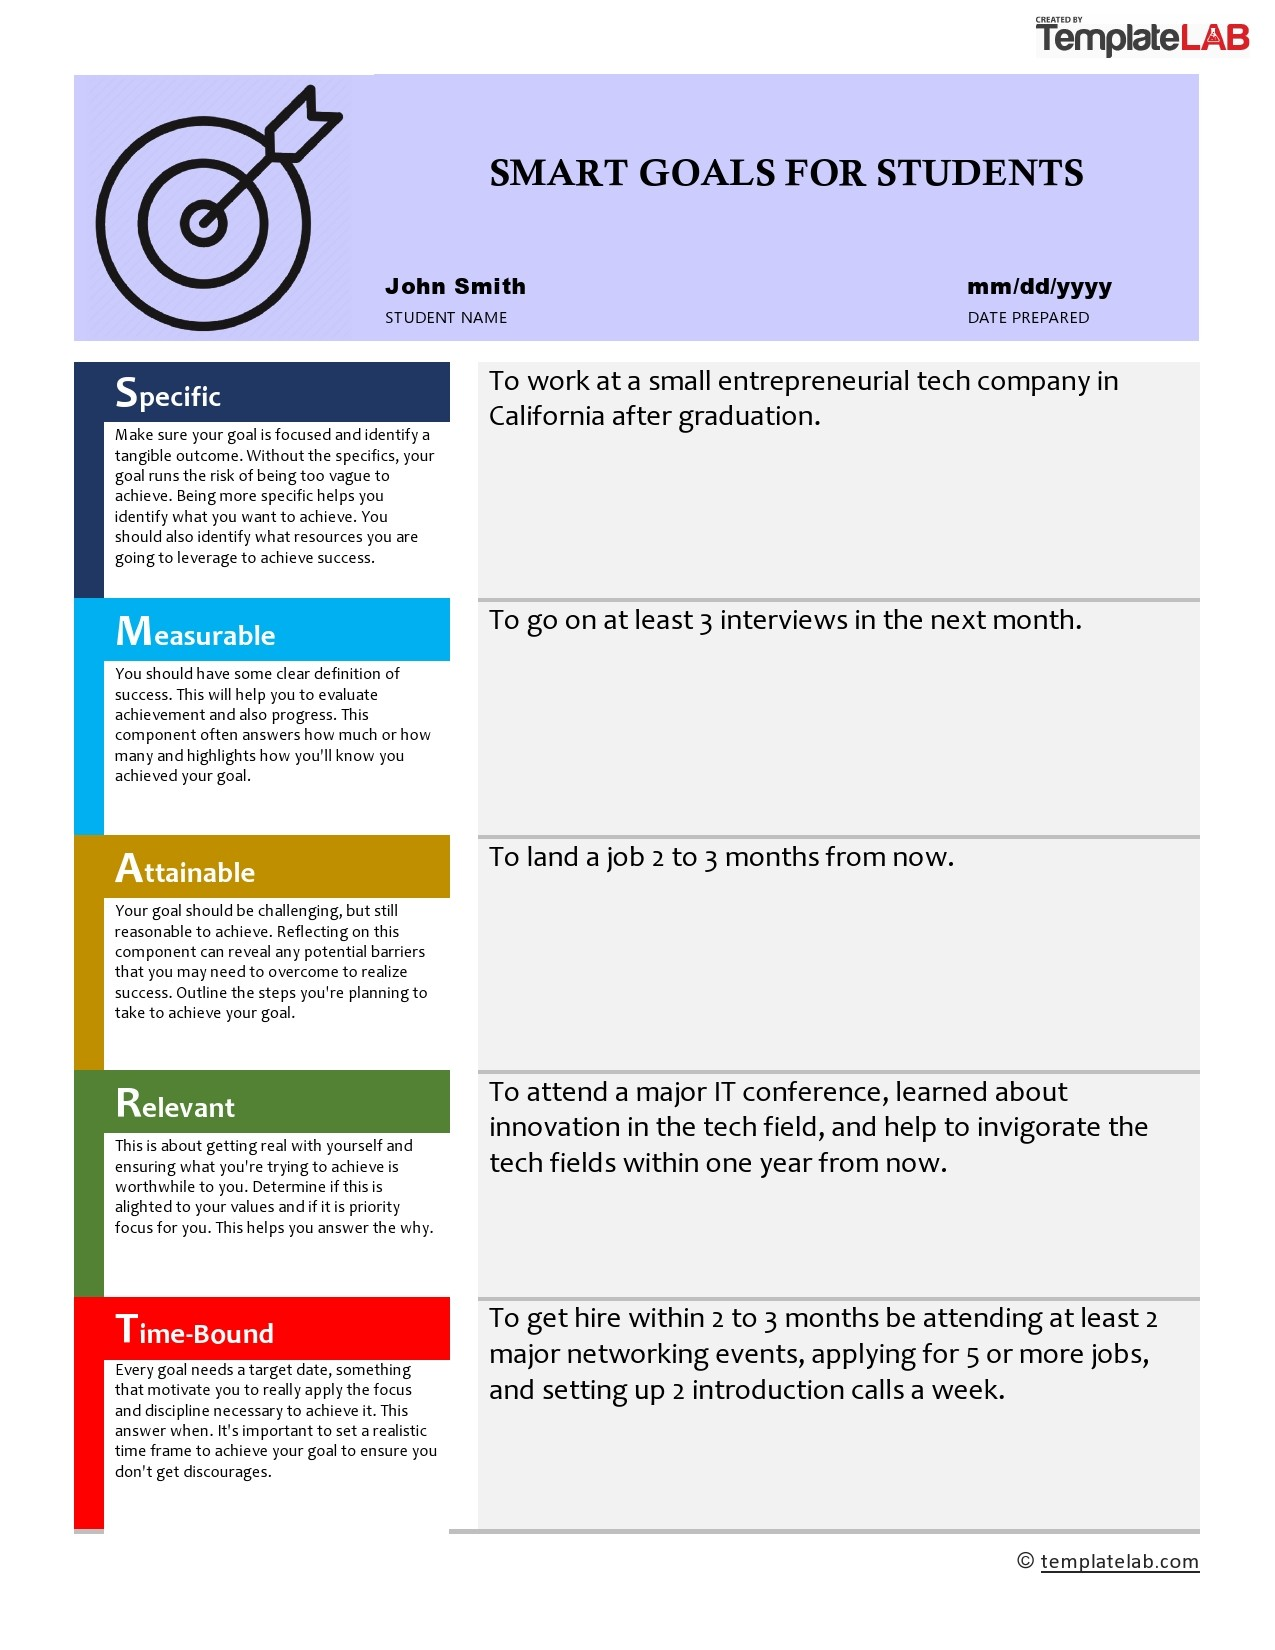 45 Smart Goals Templates Examples Worksheets ᐅ Templatelab